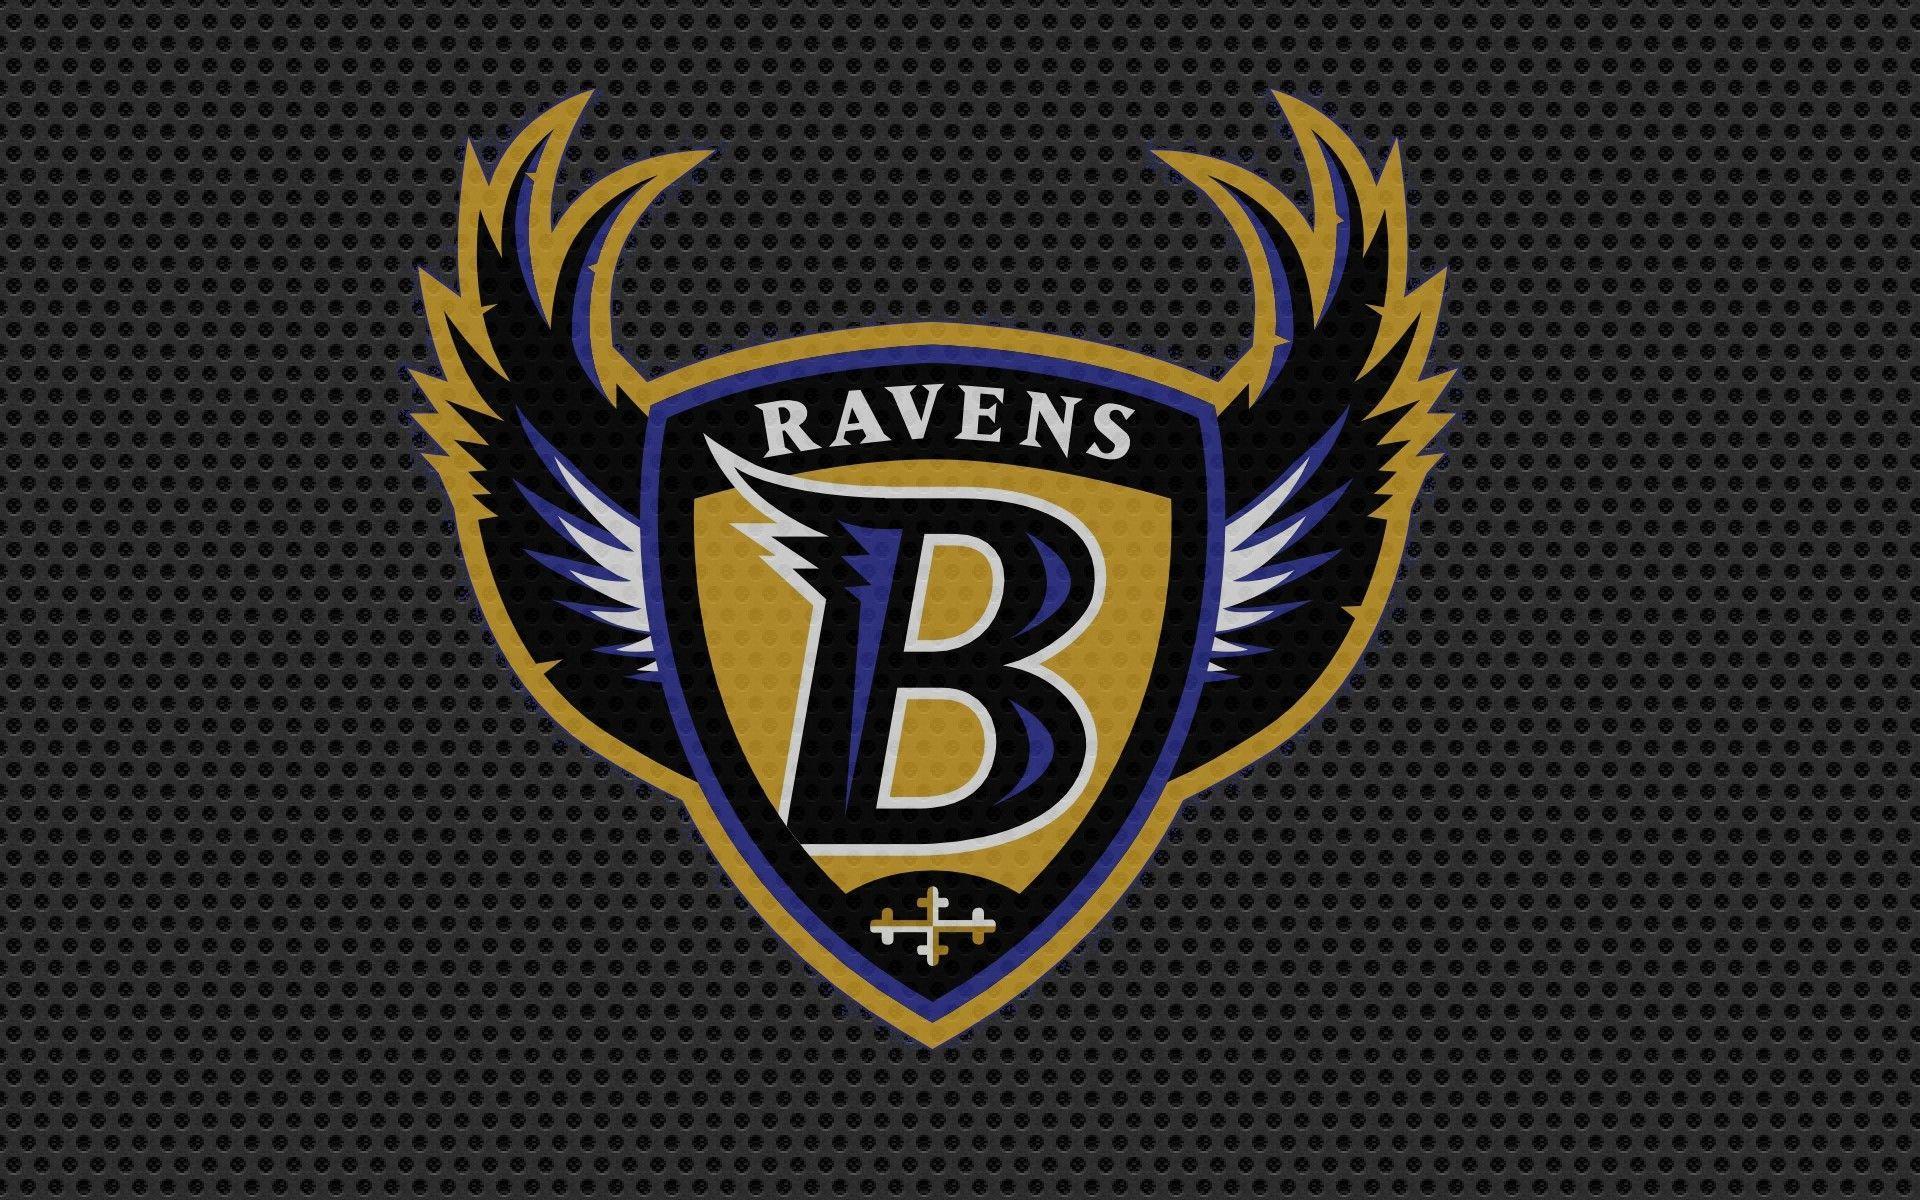 Ravens Logo Wallpapers - Wallpaper Cave